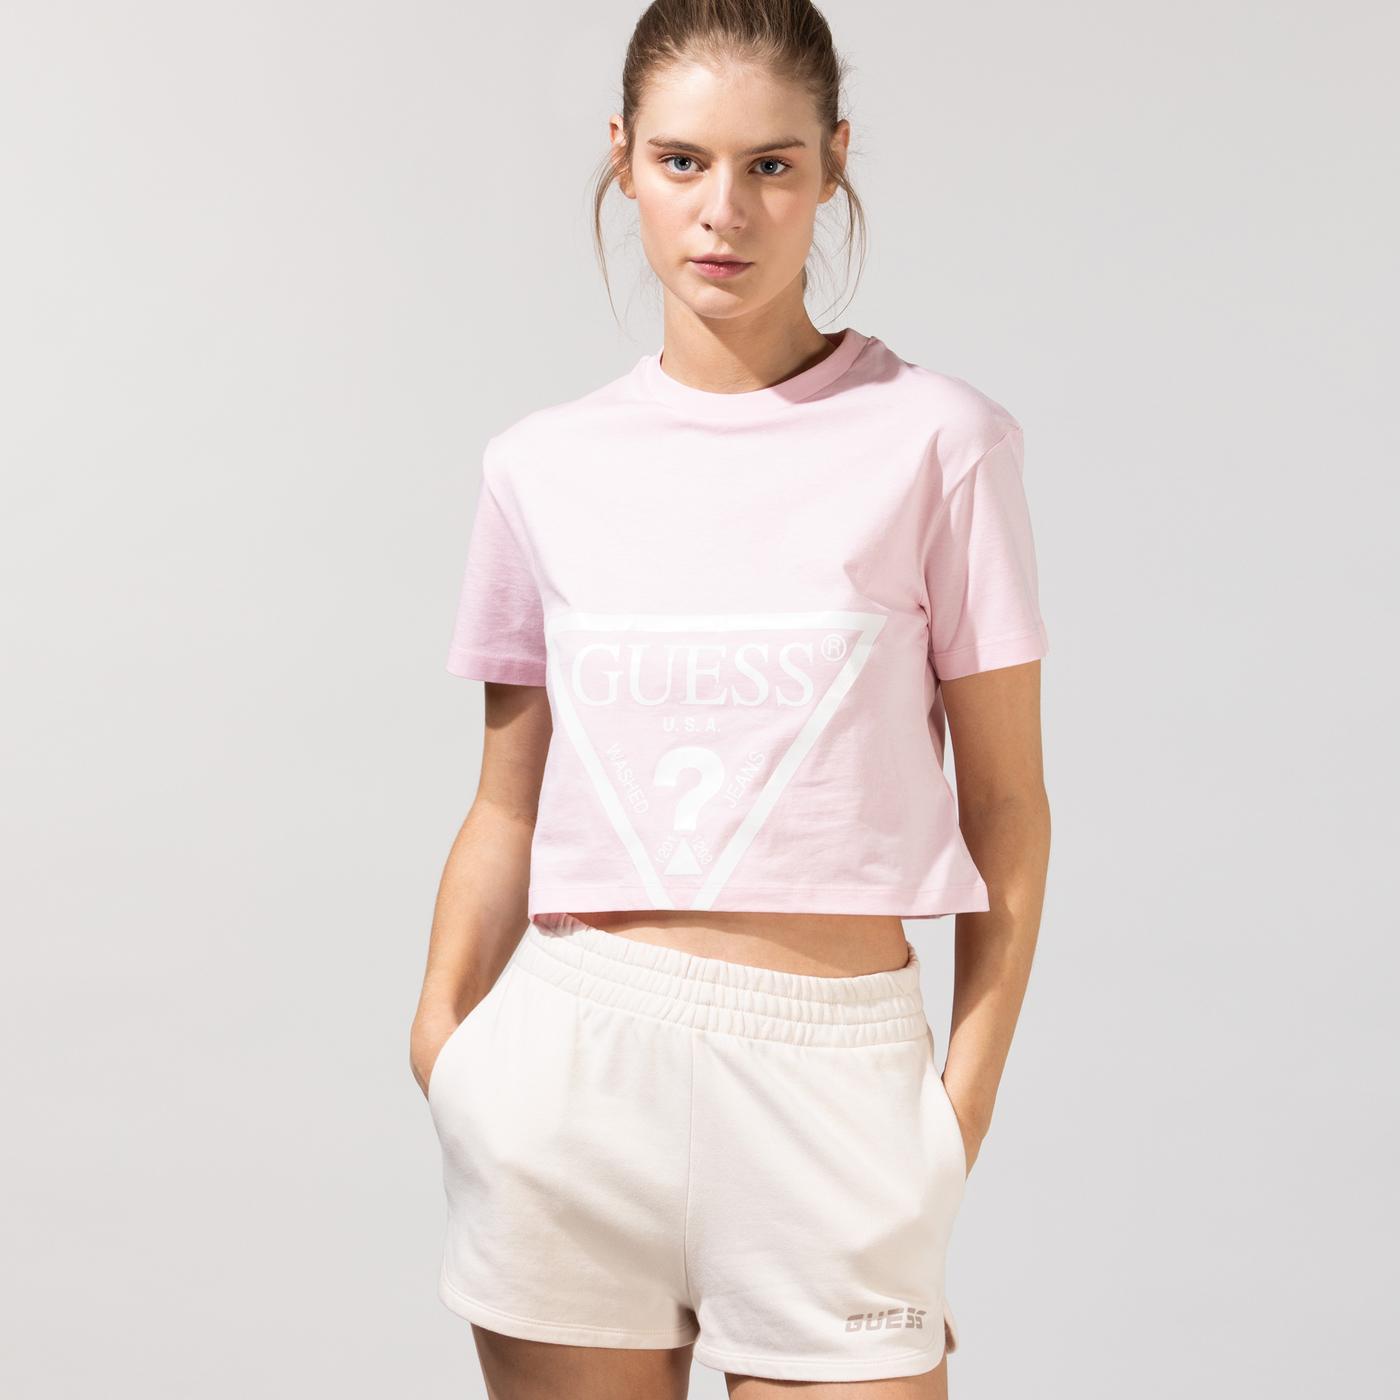 Guess Kadın Pembe T-Shirt